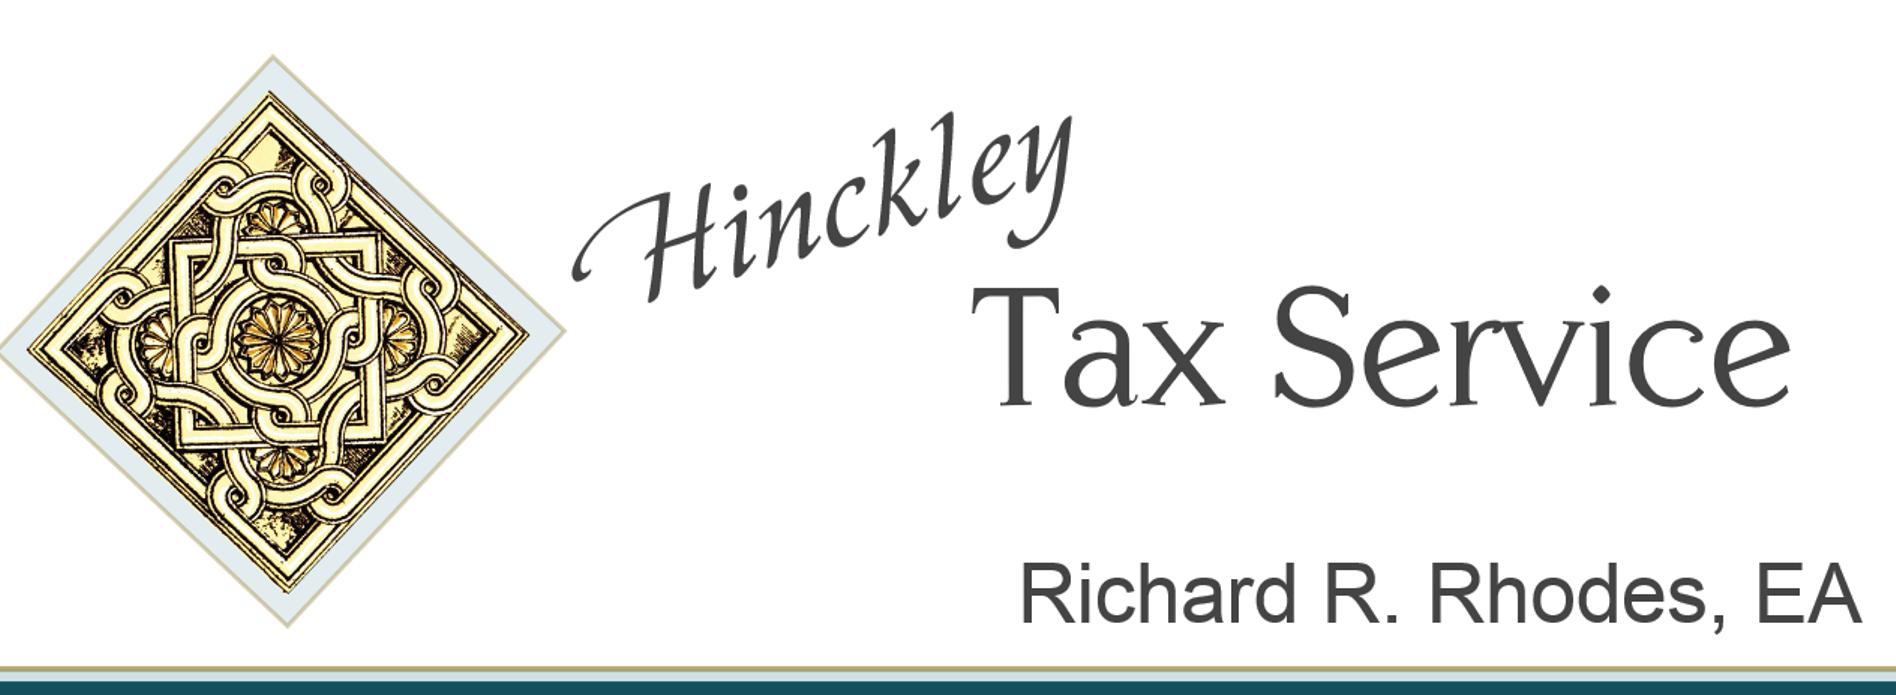 Hinckley Tax Service